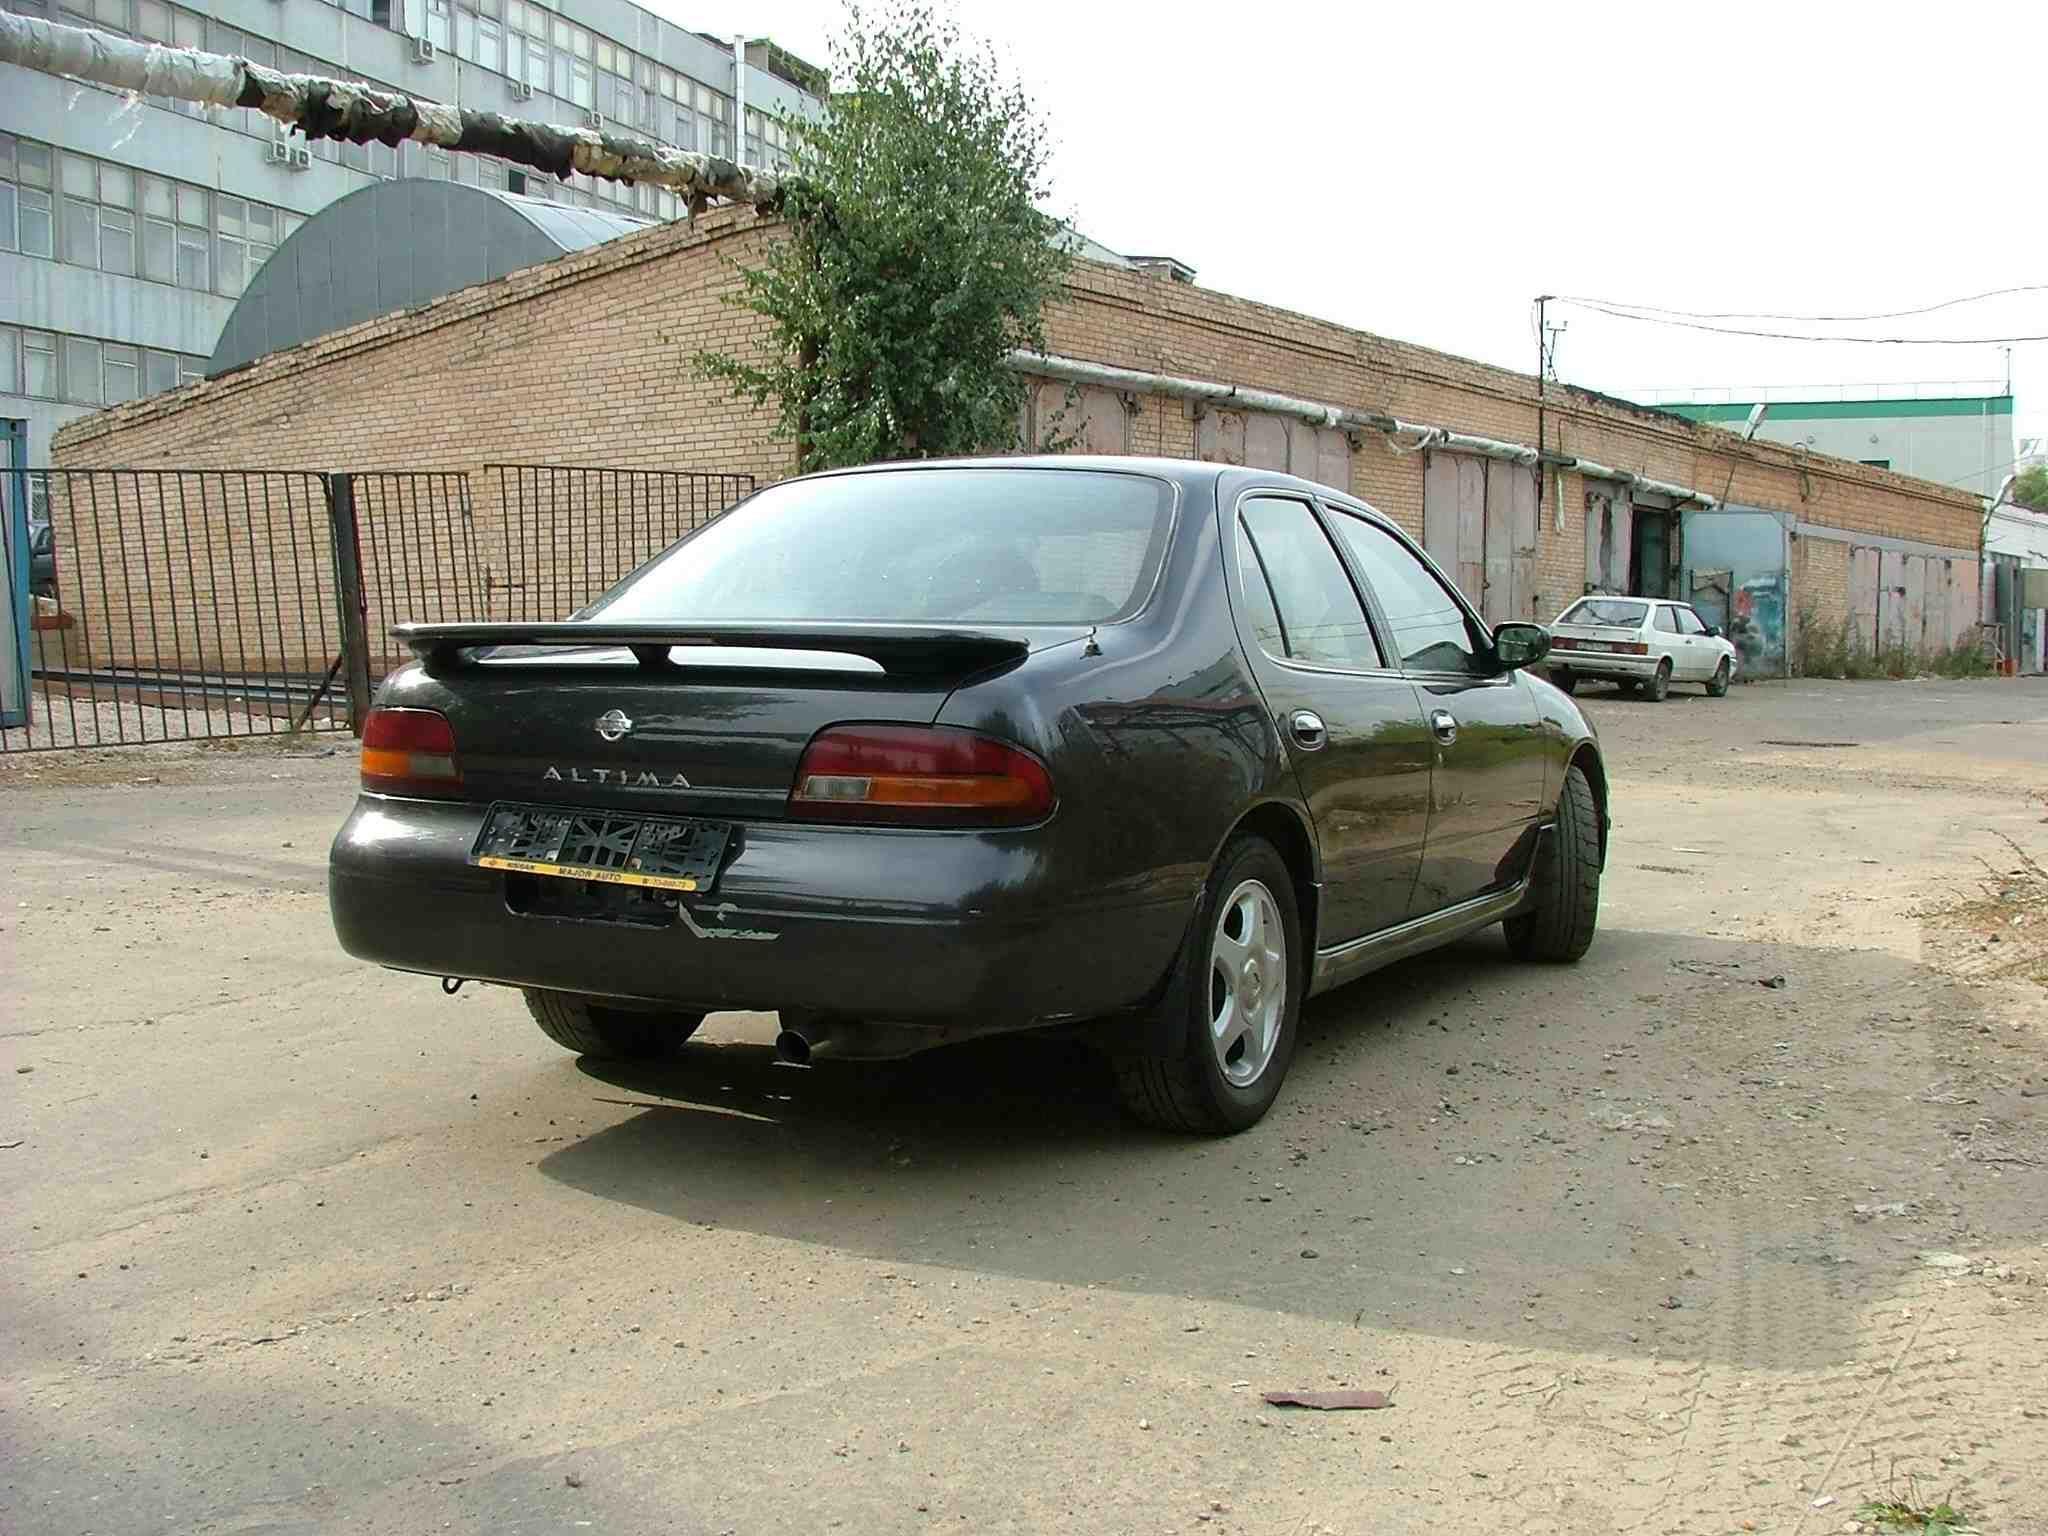 1993 nissan altima pictures 2400cc gasoline ff manual for sale rh cars directory net 2007 Nissan Altima 2005 Nissan Altima